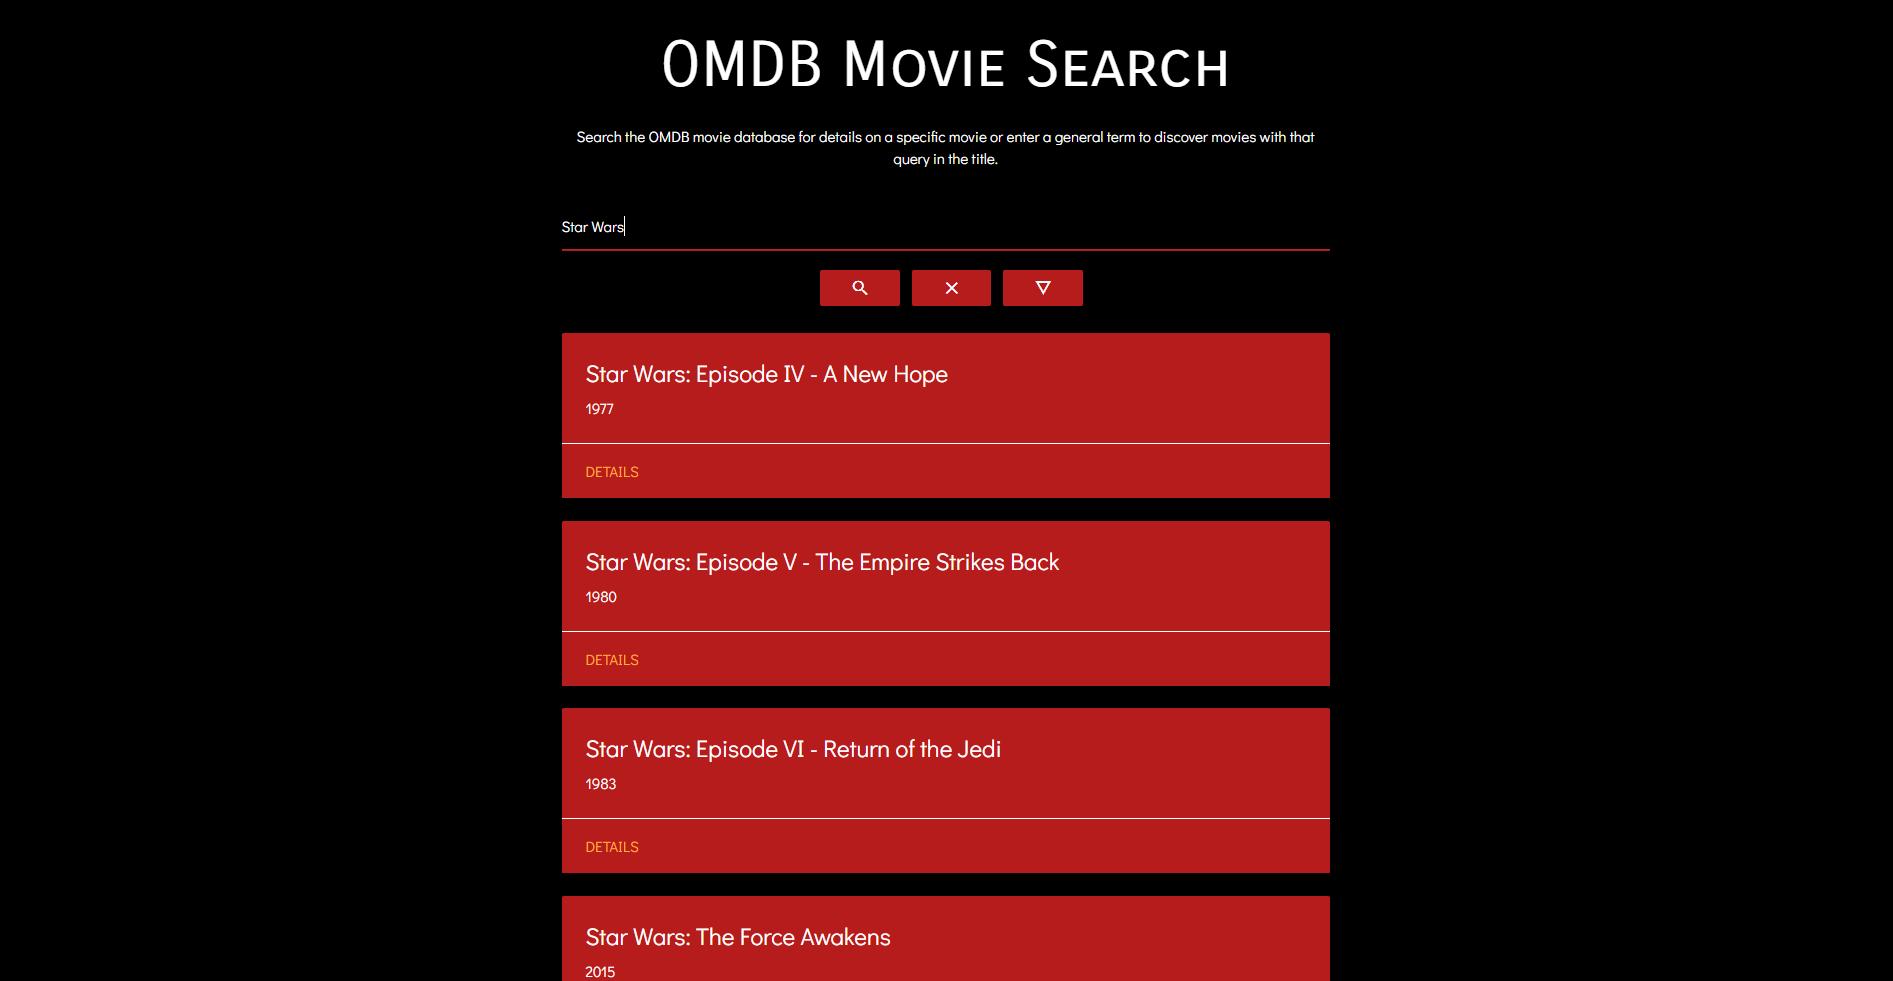 GitHub - TheCodingCarlson/react-omdb-app: A simple React app